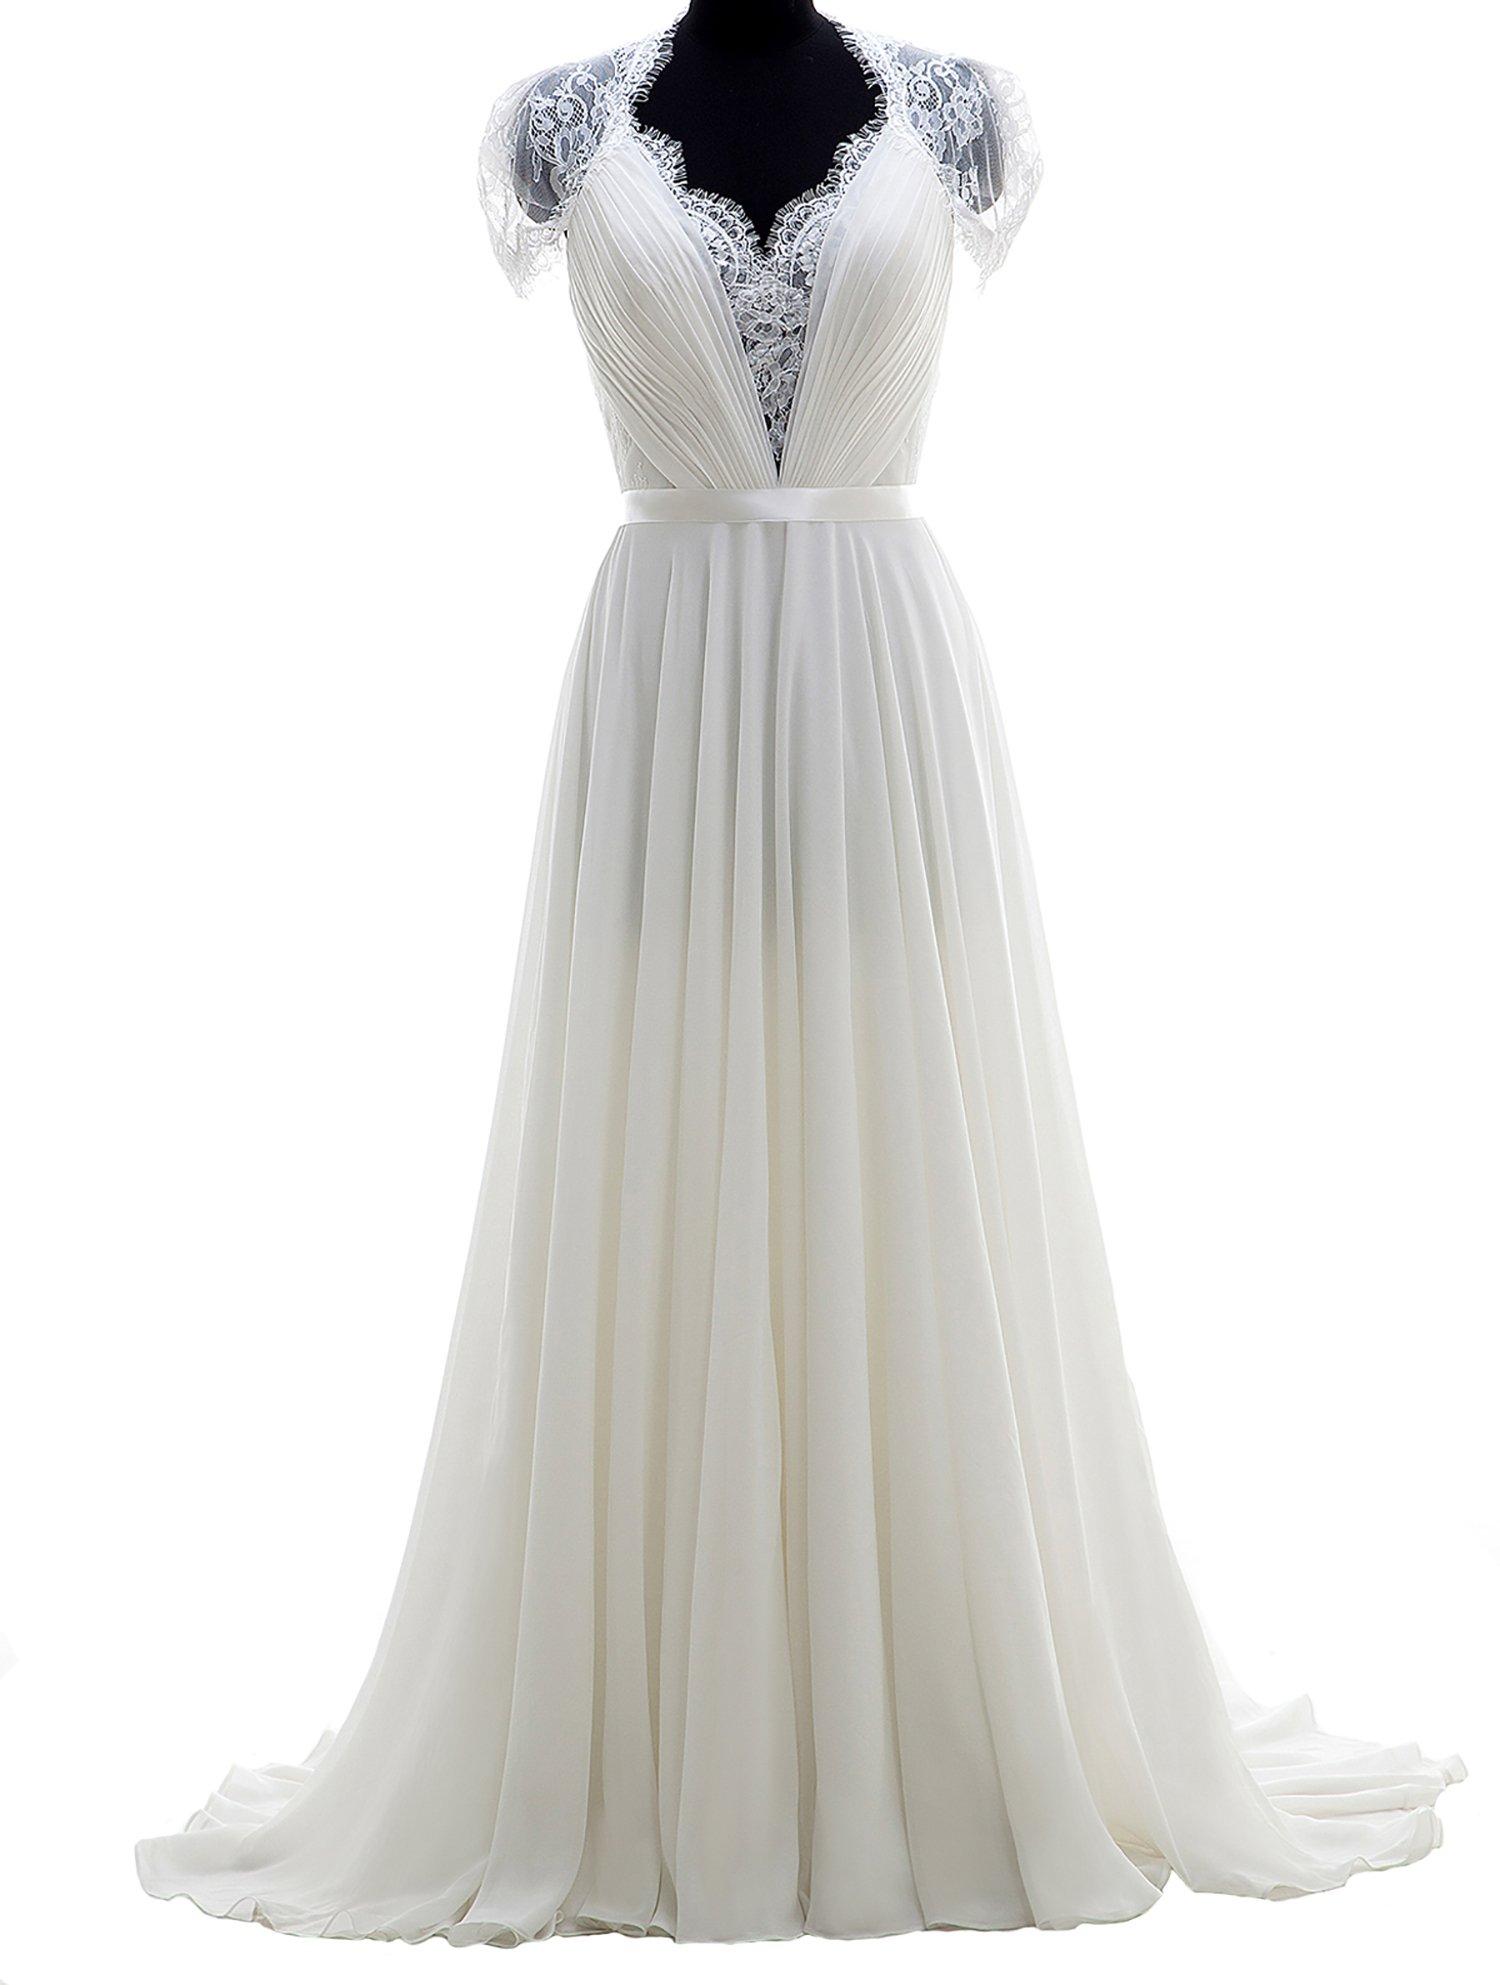 Cahayi Chiffon V-Neck Short Sleeve Boho Wedding Dress Bridal Gowns Prom Dress